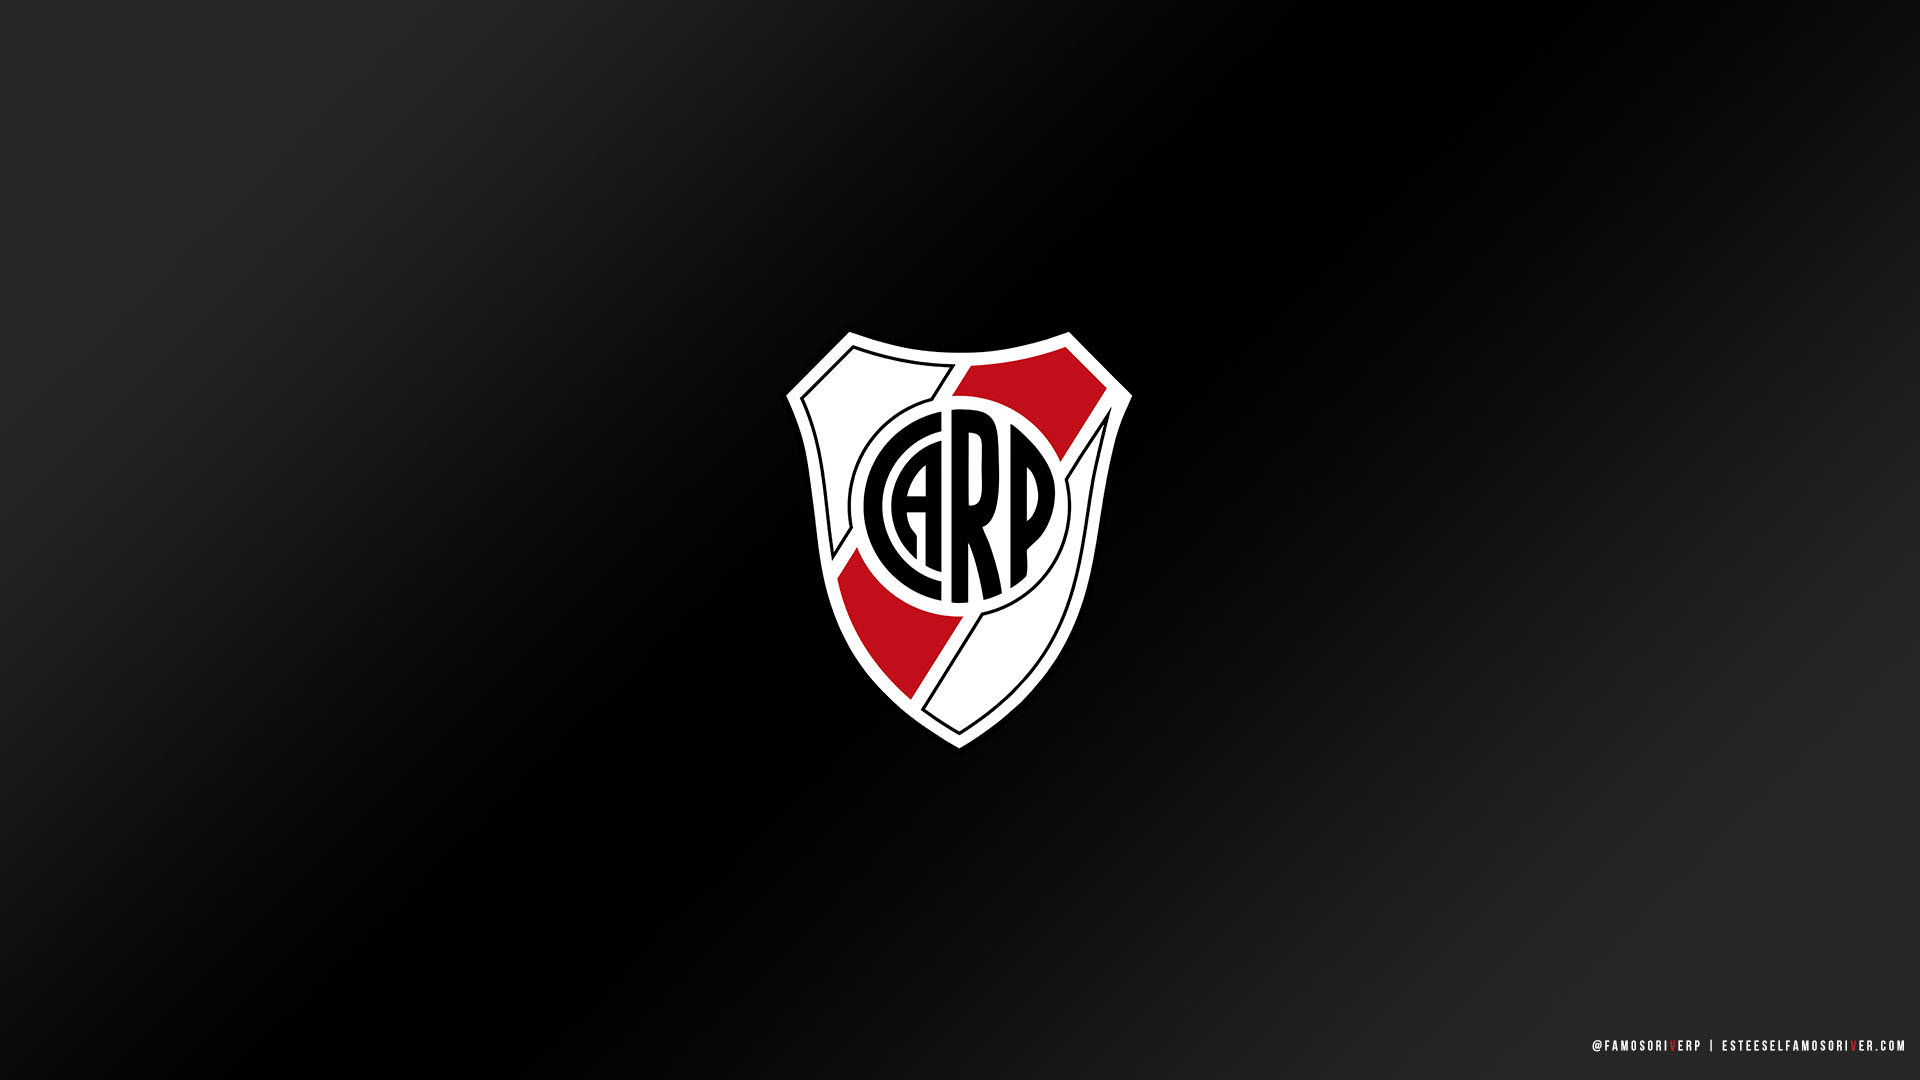 imagenes-de-River-Plate-para-fondos-de-pantalla-wallpaper-de-River-Escudo River Plate - Fondo negro